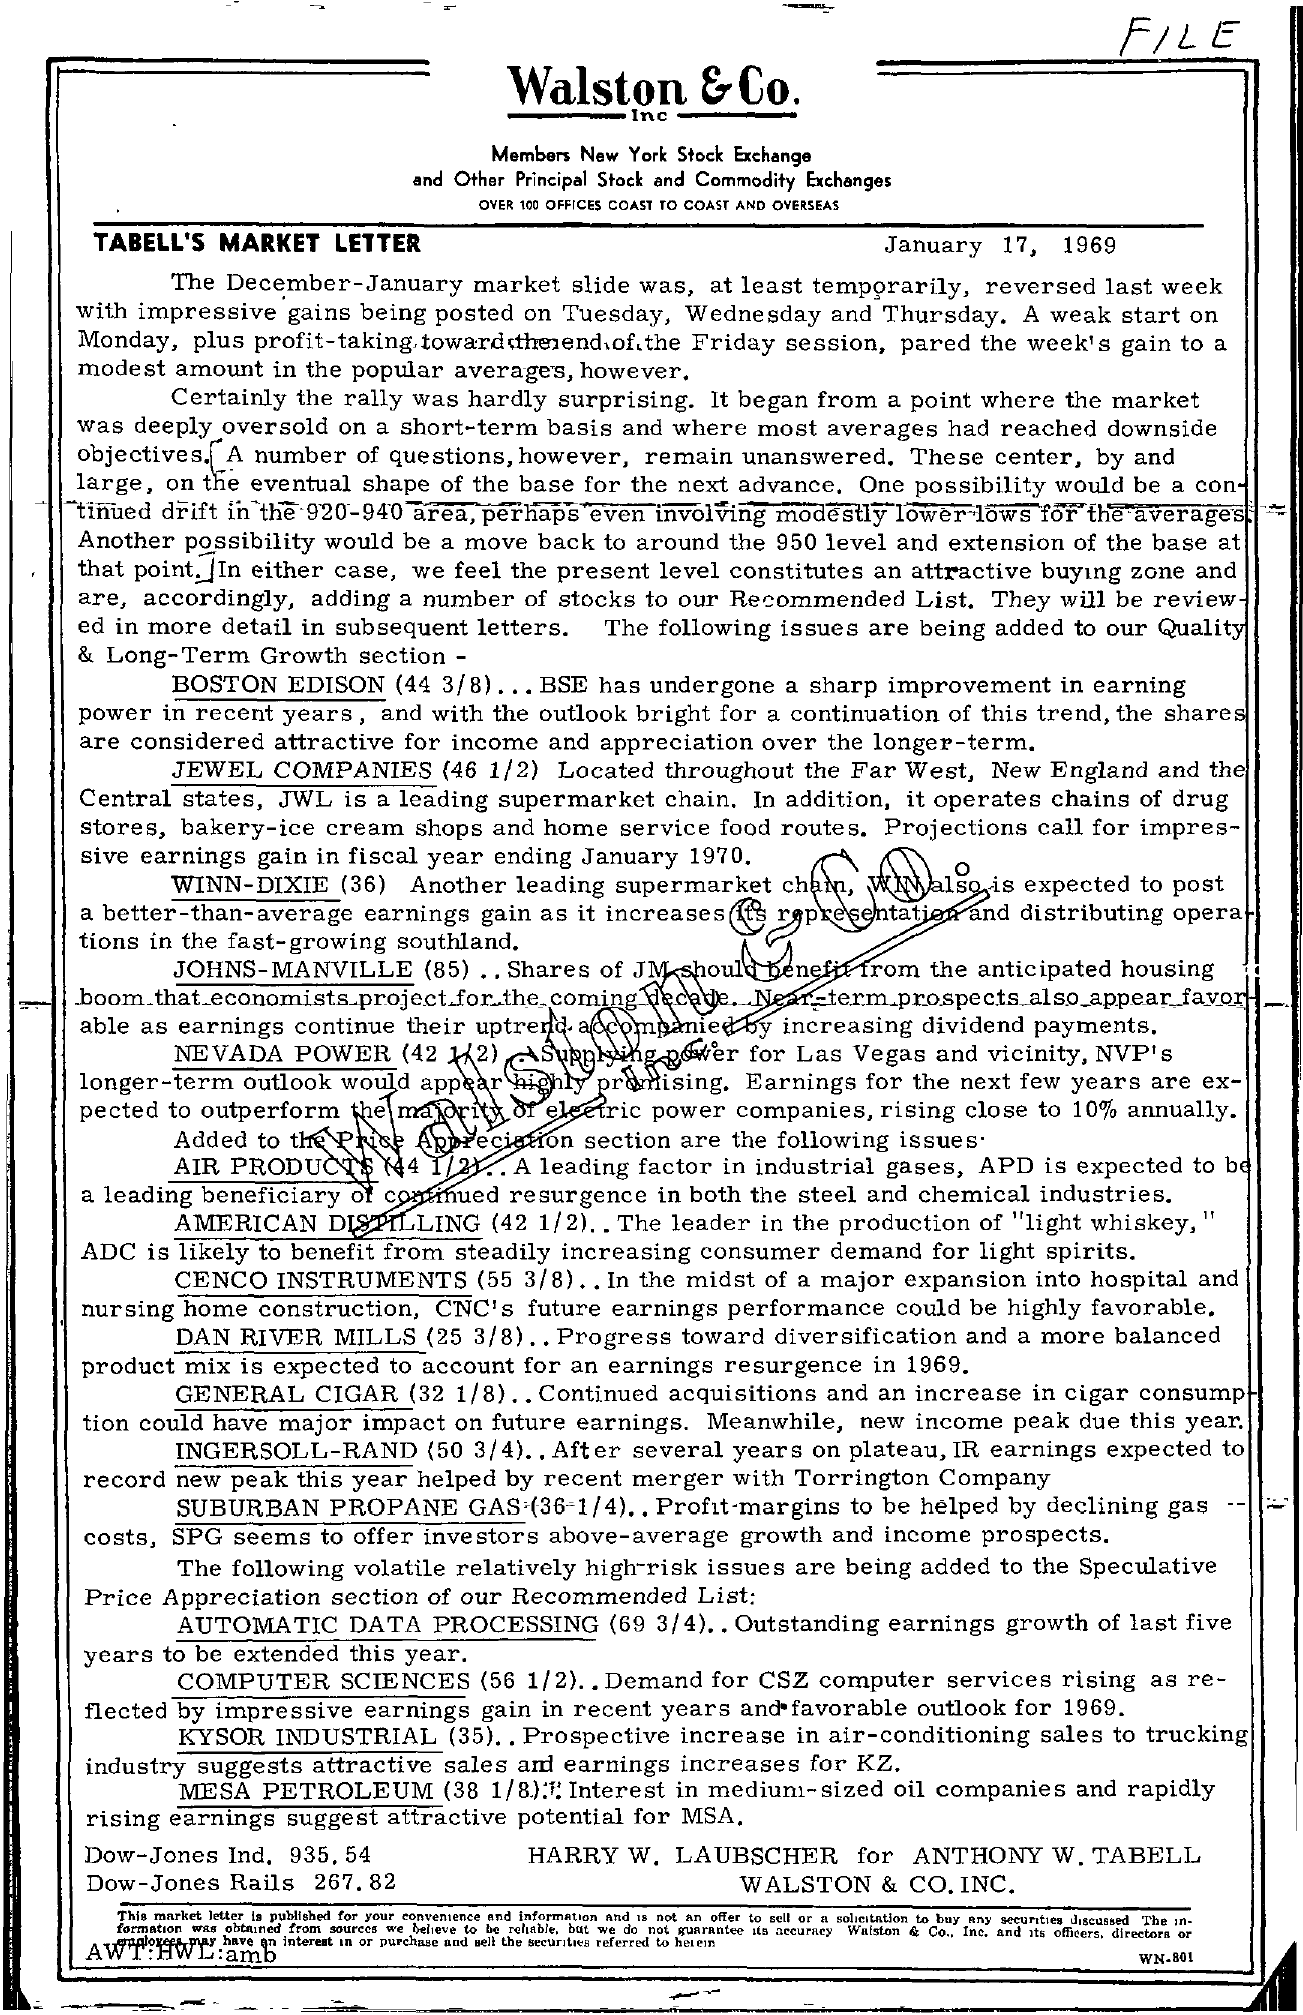 Tabell's Market Letter - January 17, 1969